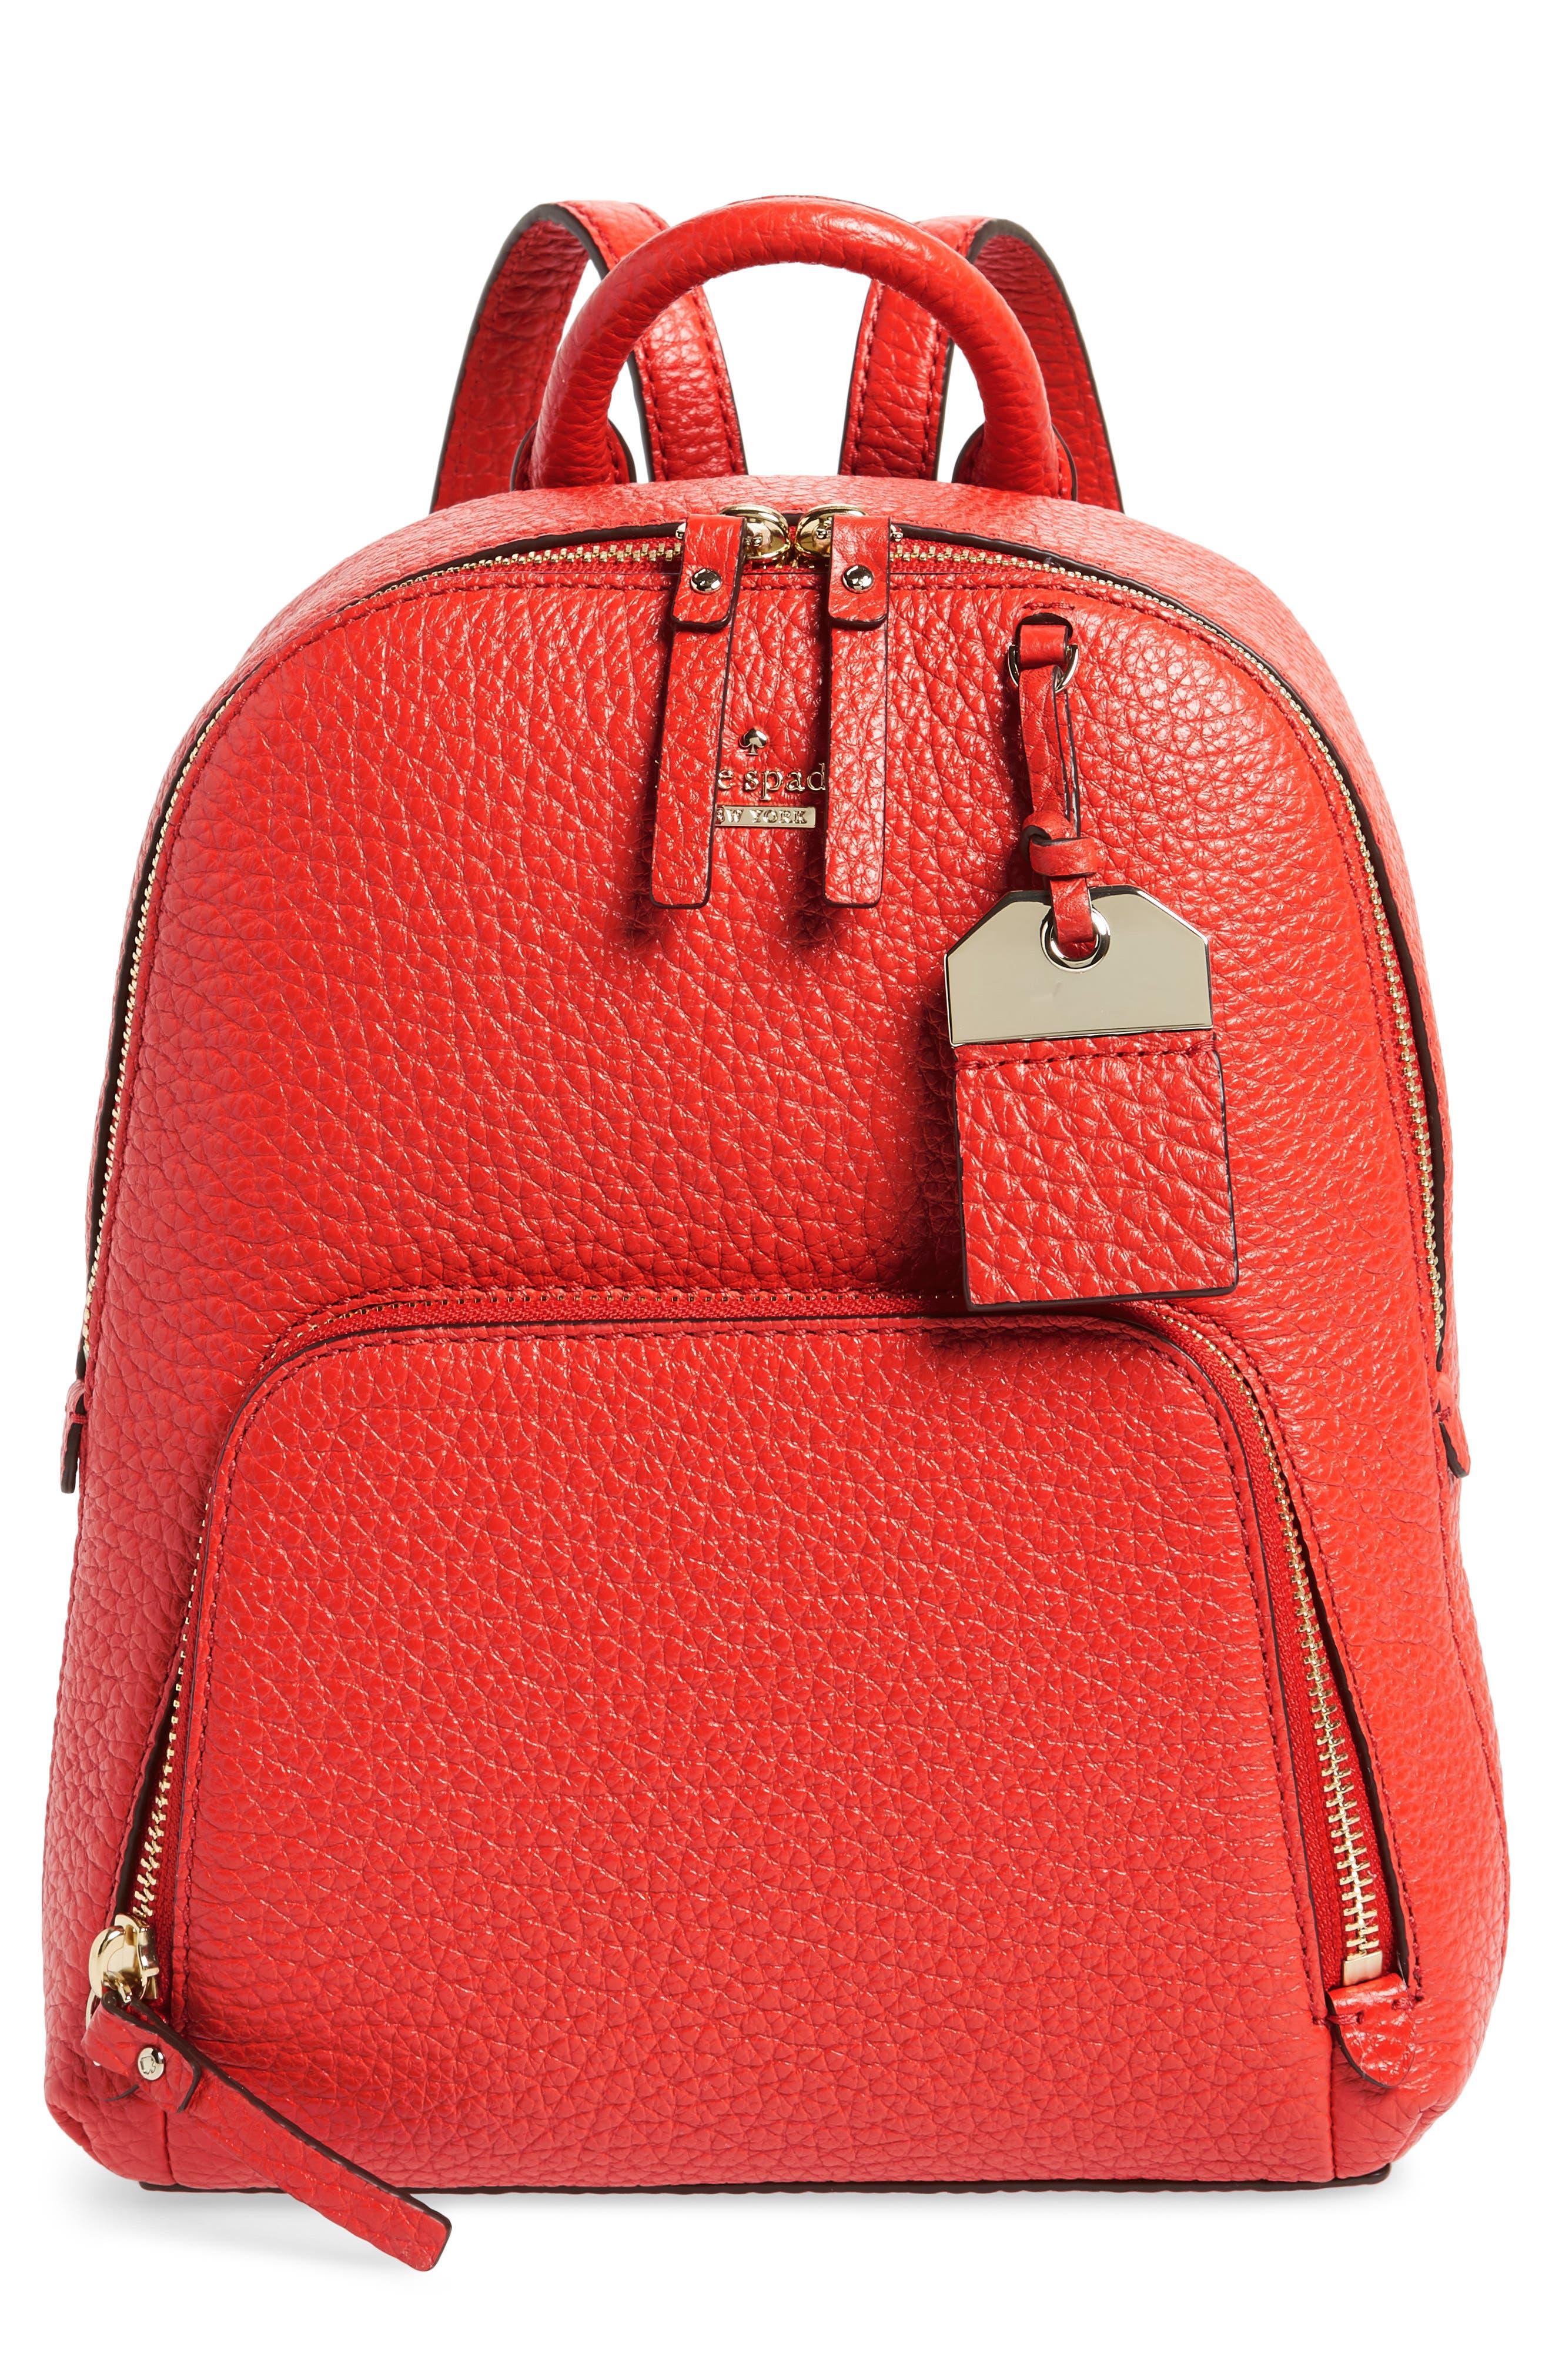 kate spade new york carter street - caden leather backpack